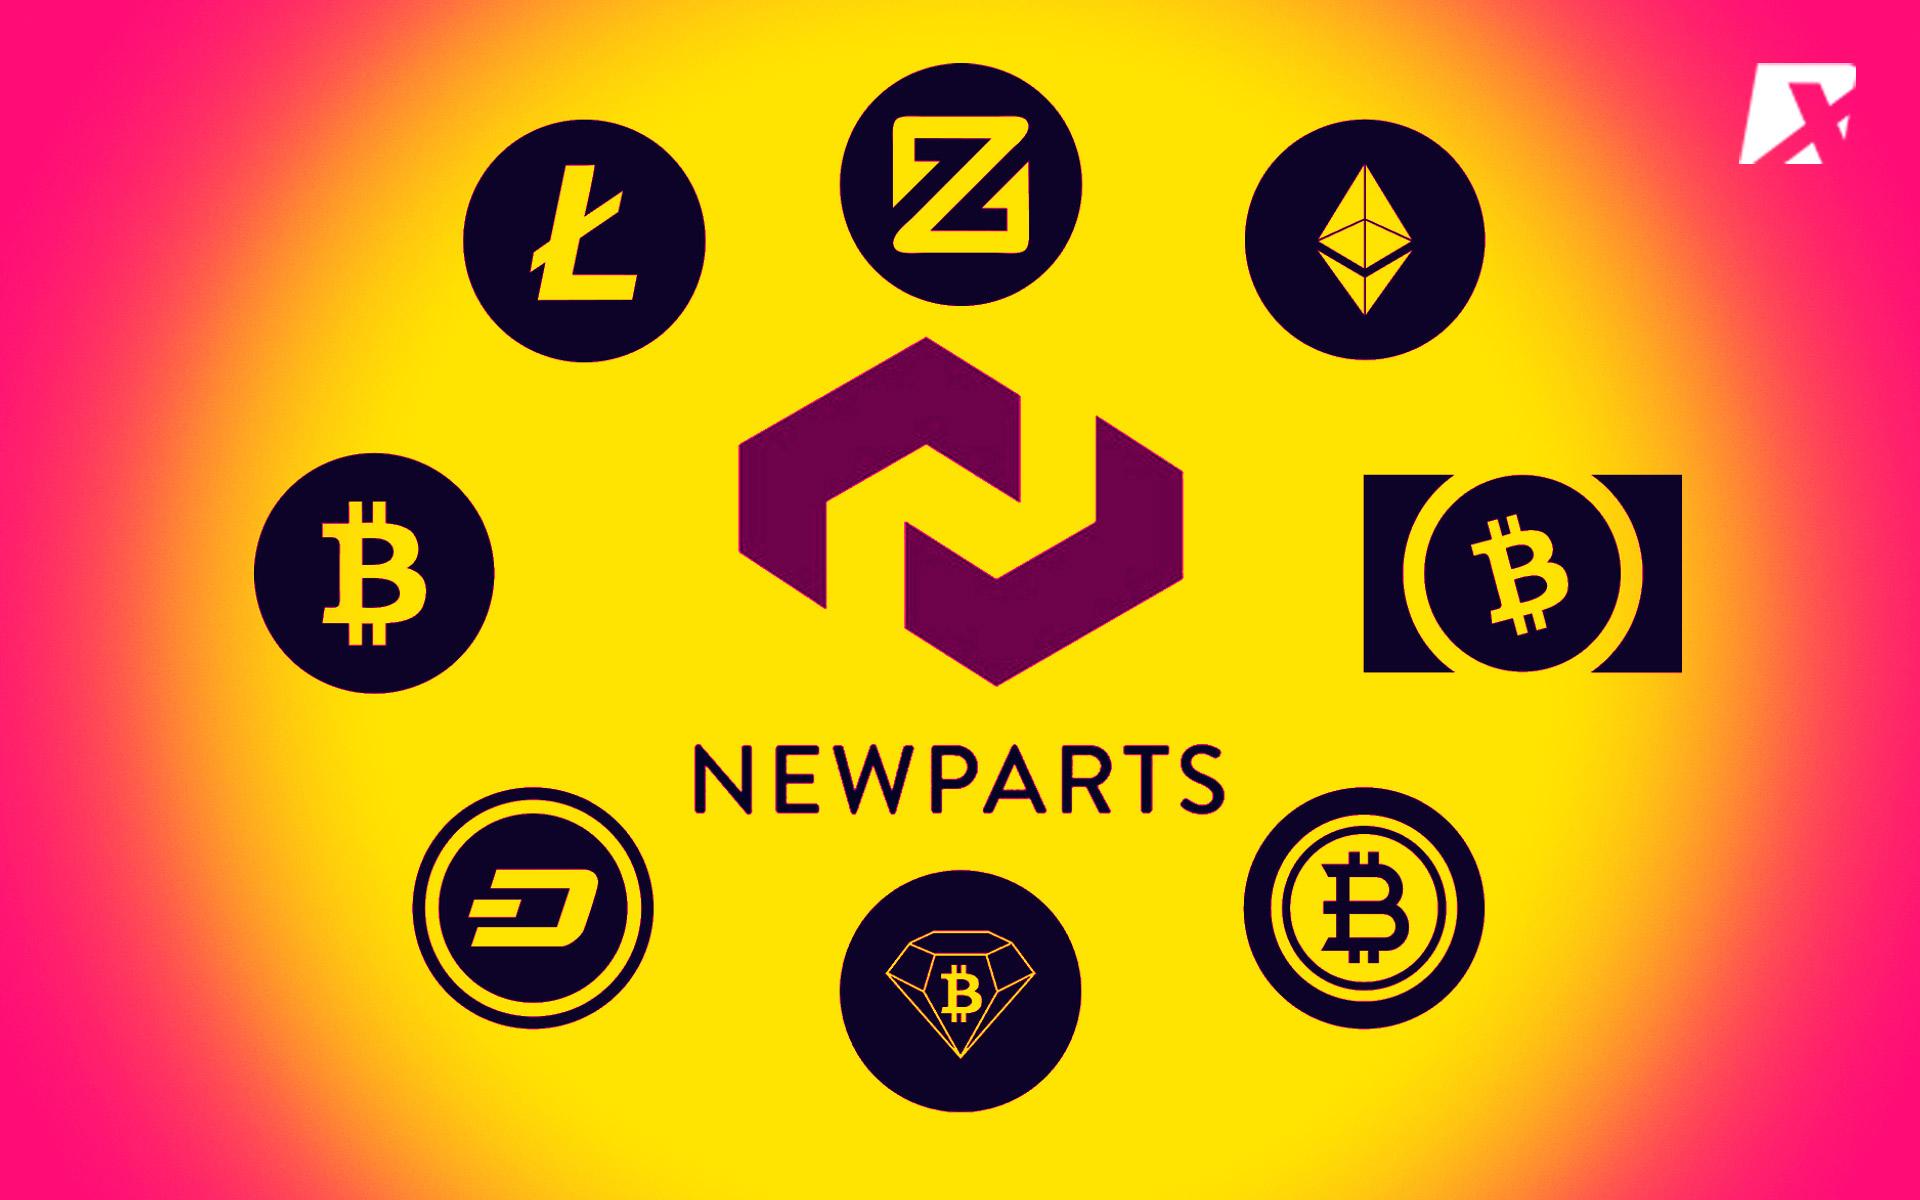 Retailer NewParts Allies With Shopping Cart Elite To Accept 8 Cryptos